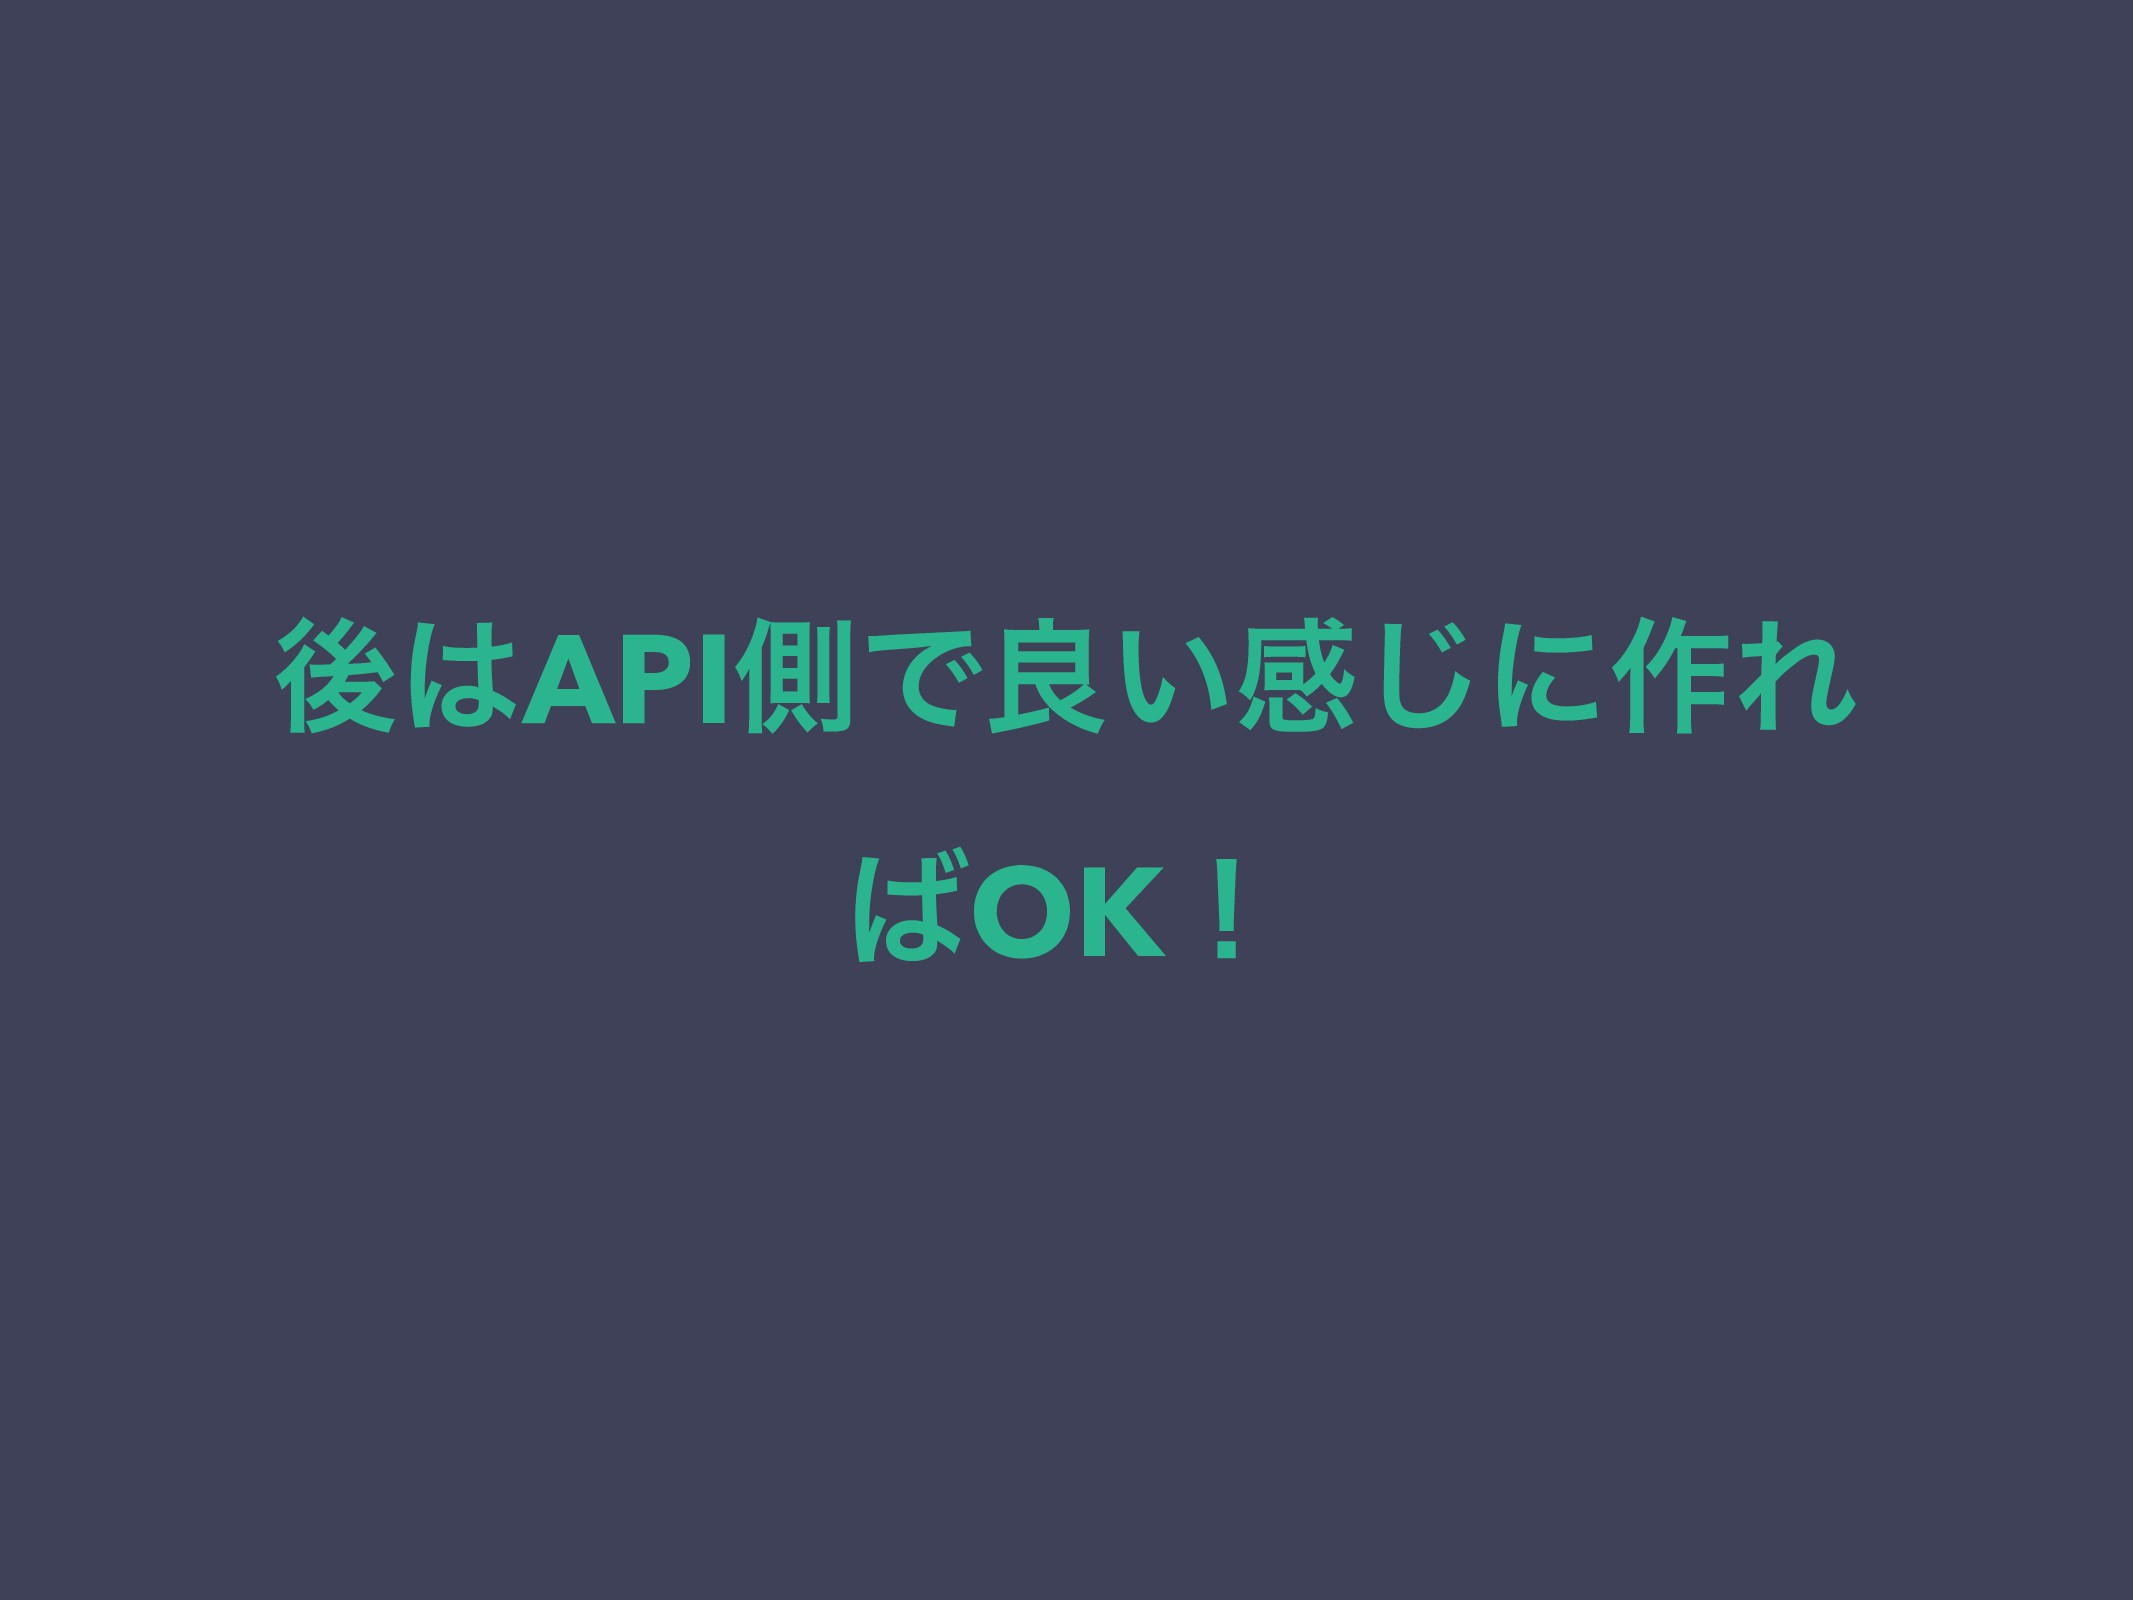 ޙAPIଆͰྑ͍ײ͡ʹ࡞Ε OKʂ